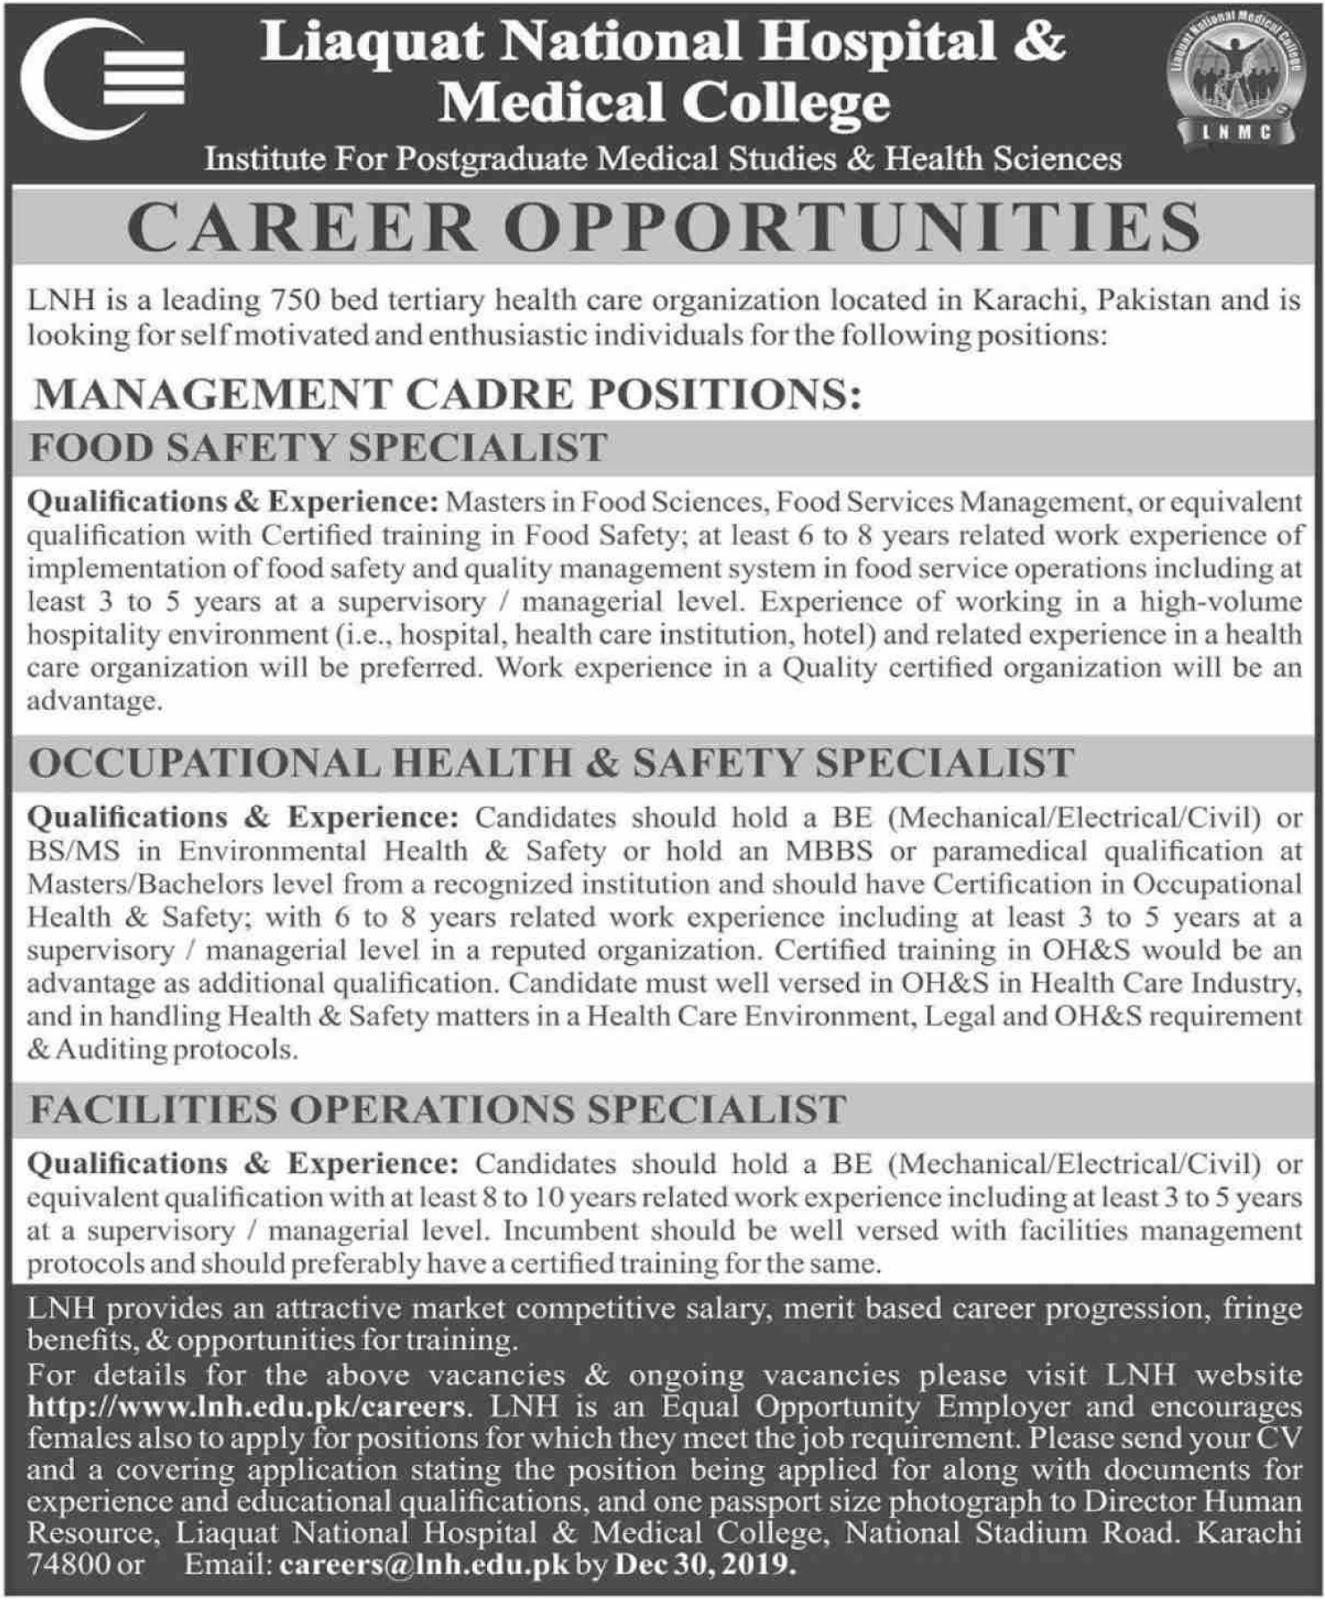 Liaquat National Hospital & Medical College Karachi Jobs 2019 Latest